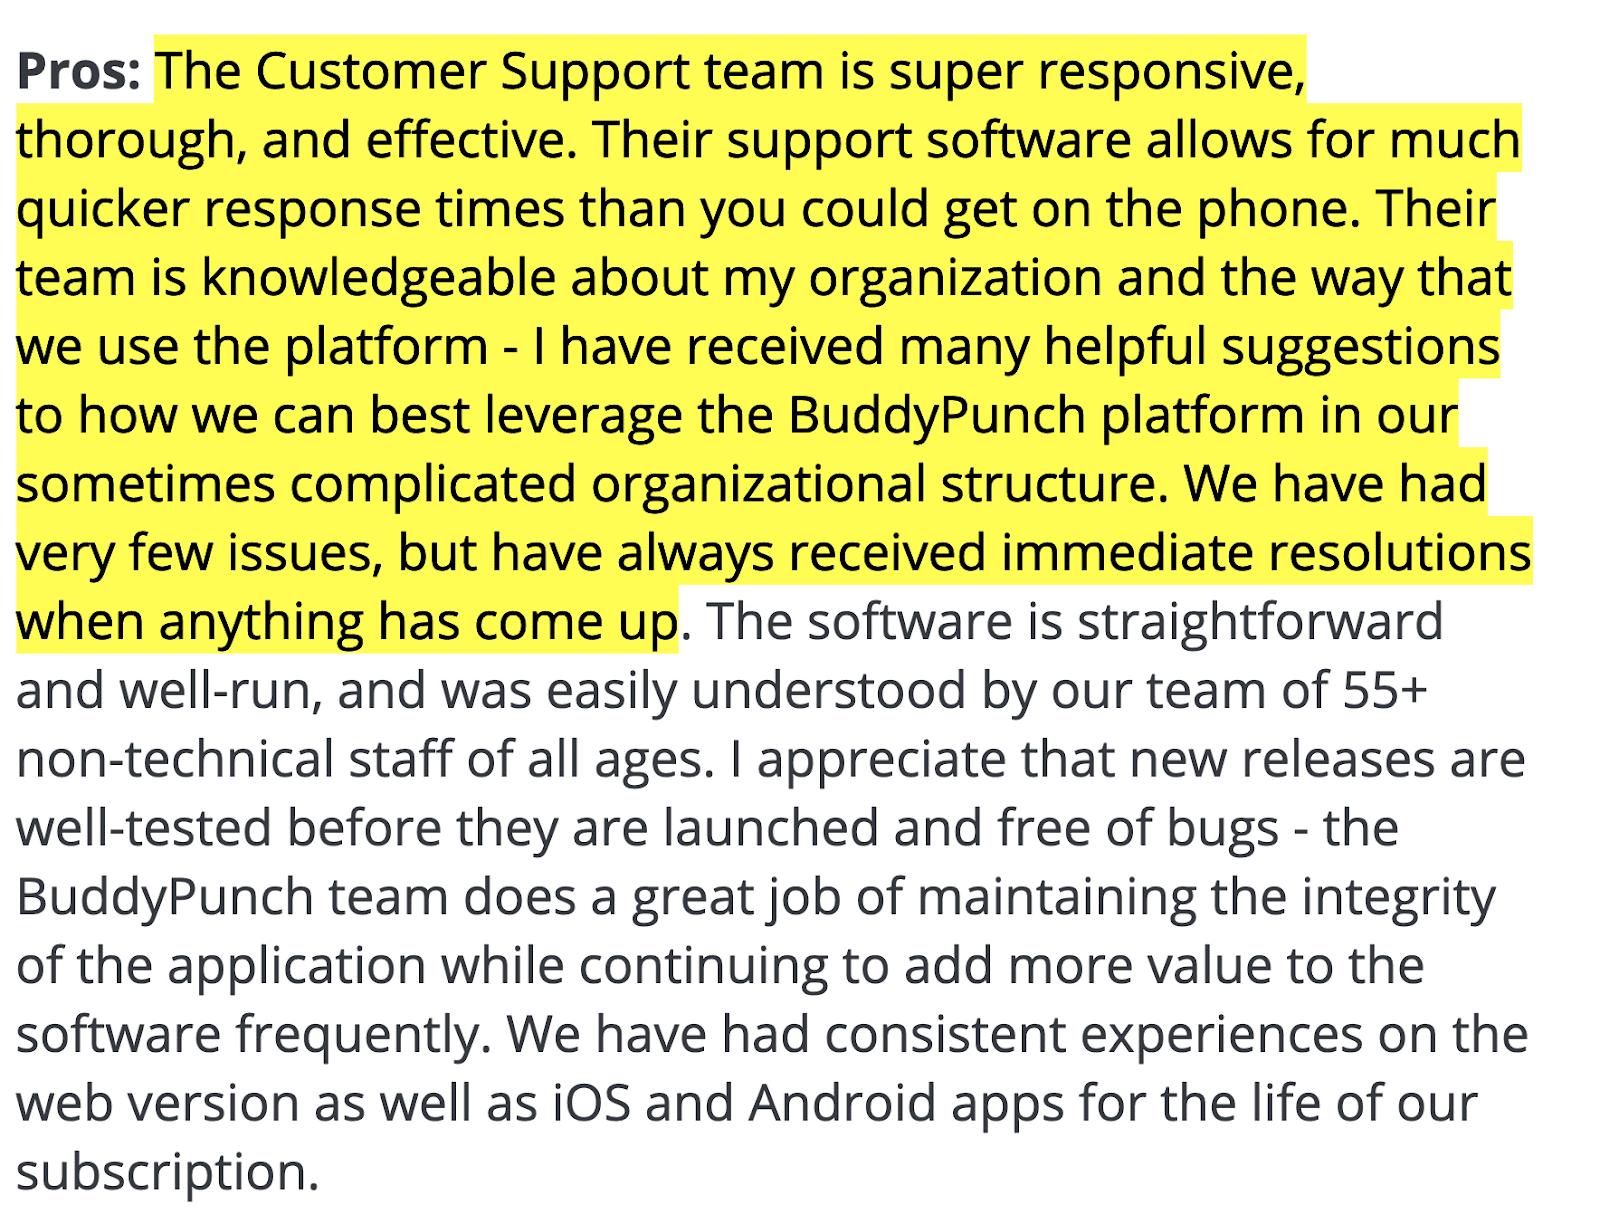 Buddy Punch review: Super responsive customer support, straightforward software, well-run, easily understood, great job.